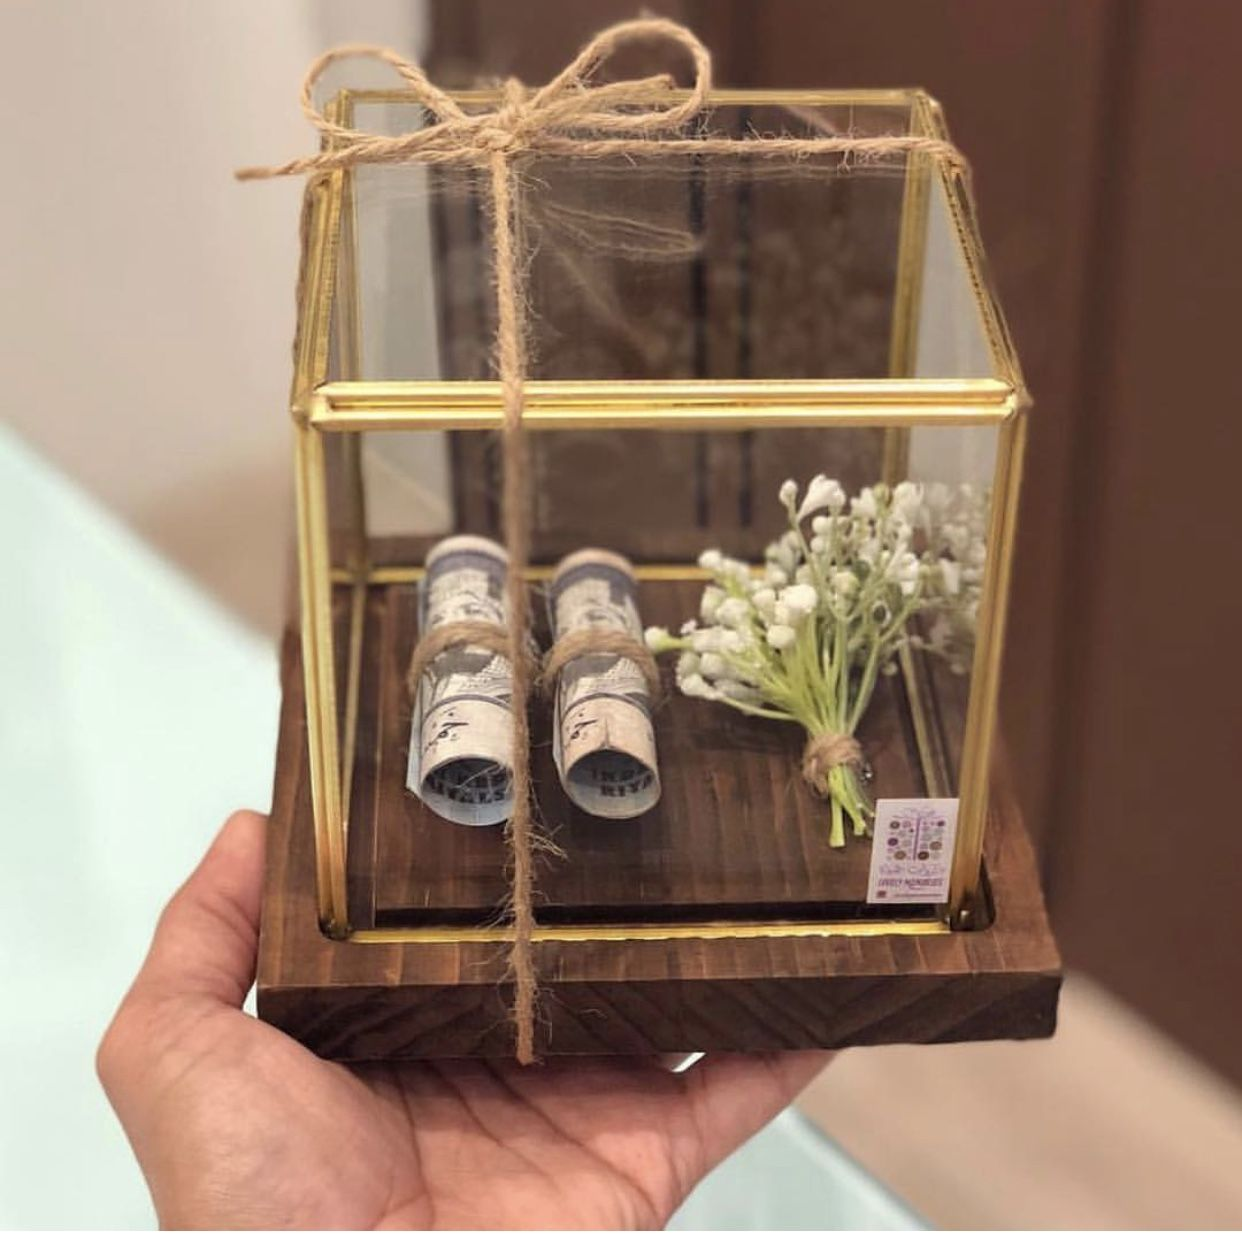 Pin By Kekeoe Rrr On افكار تغليف Handmade Wedding Gifts Flower Box Gift Diy Gift Wrapping